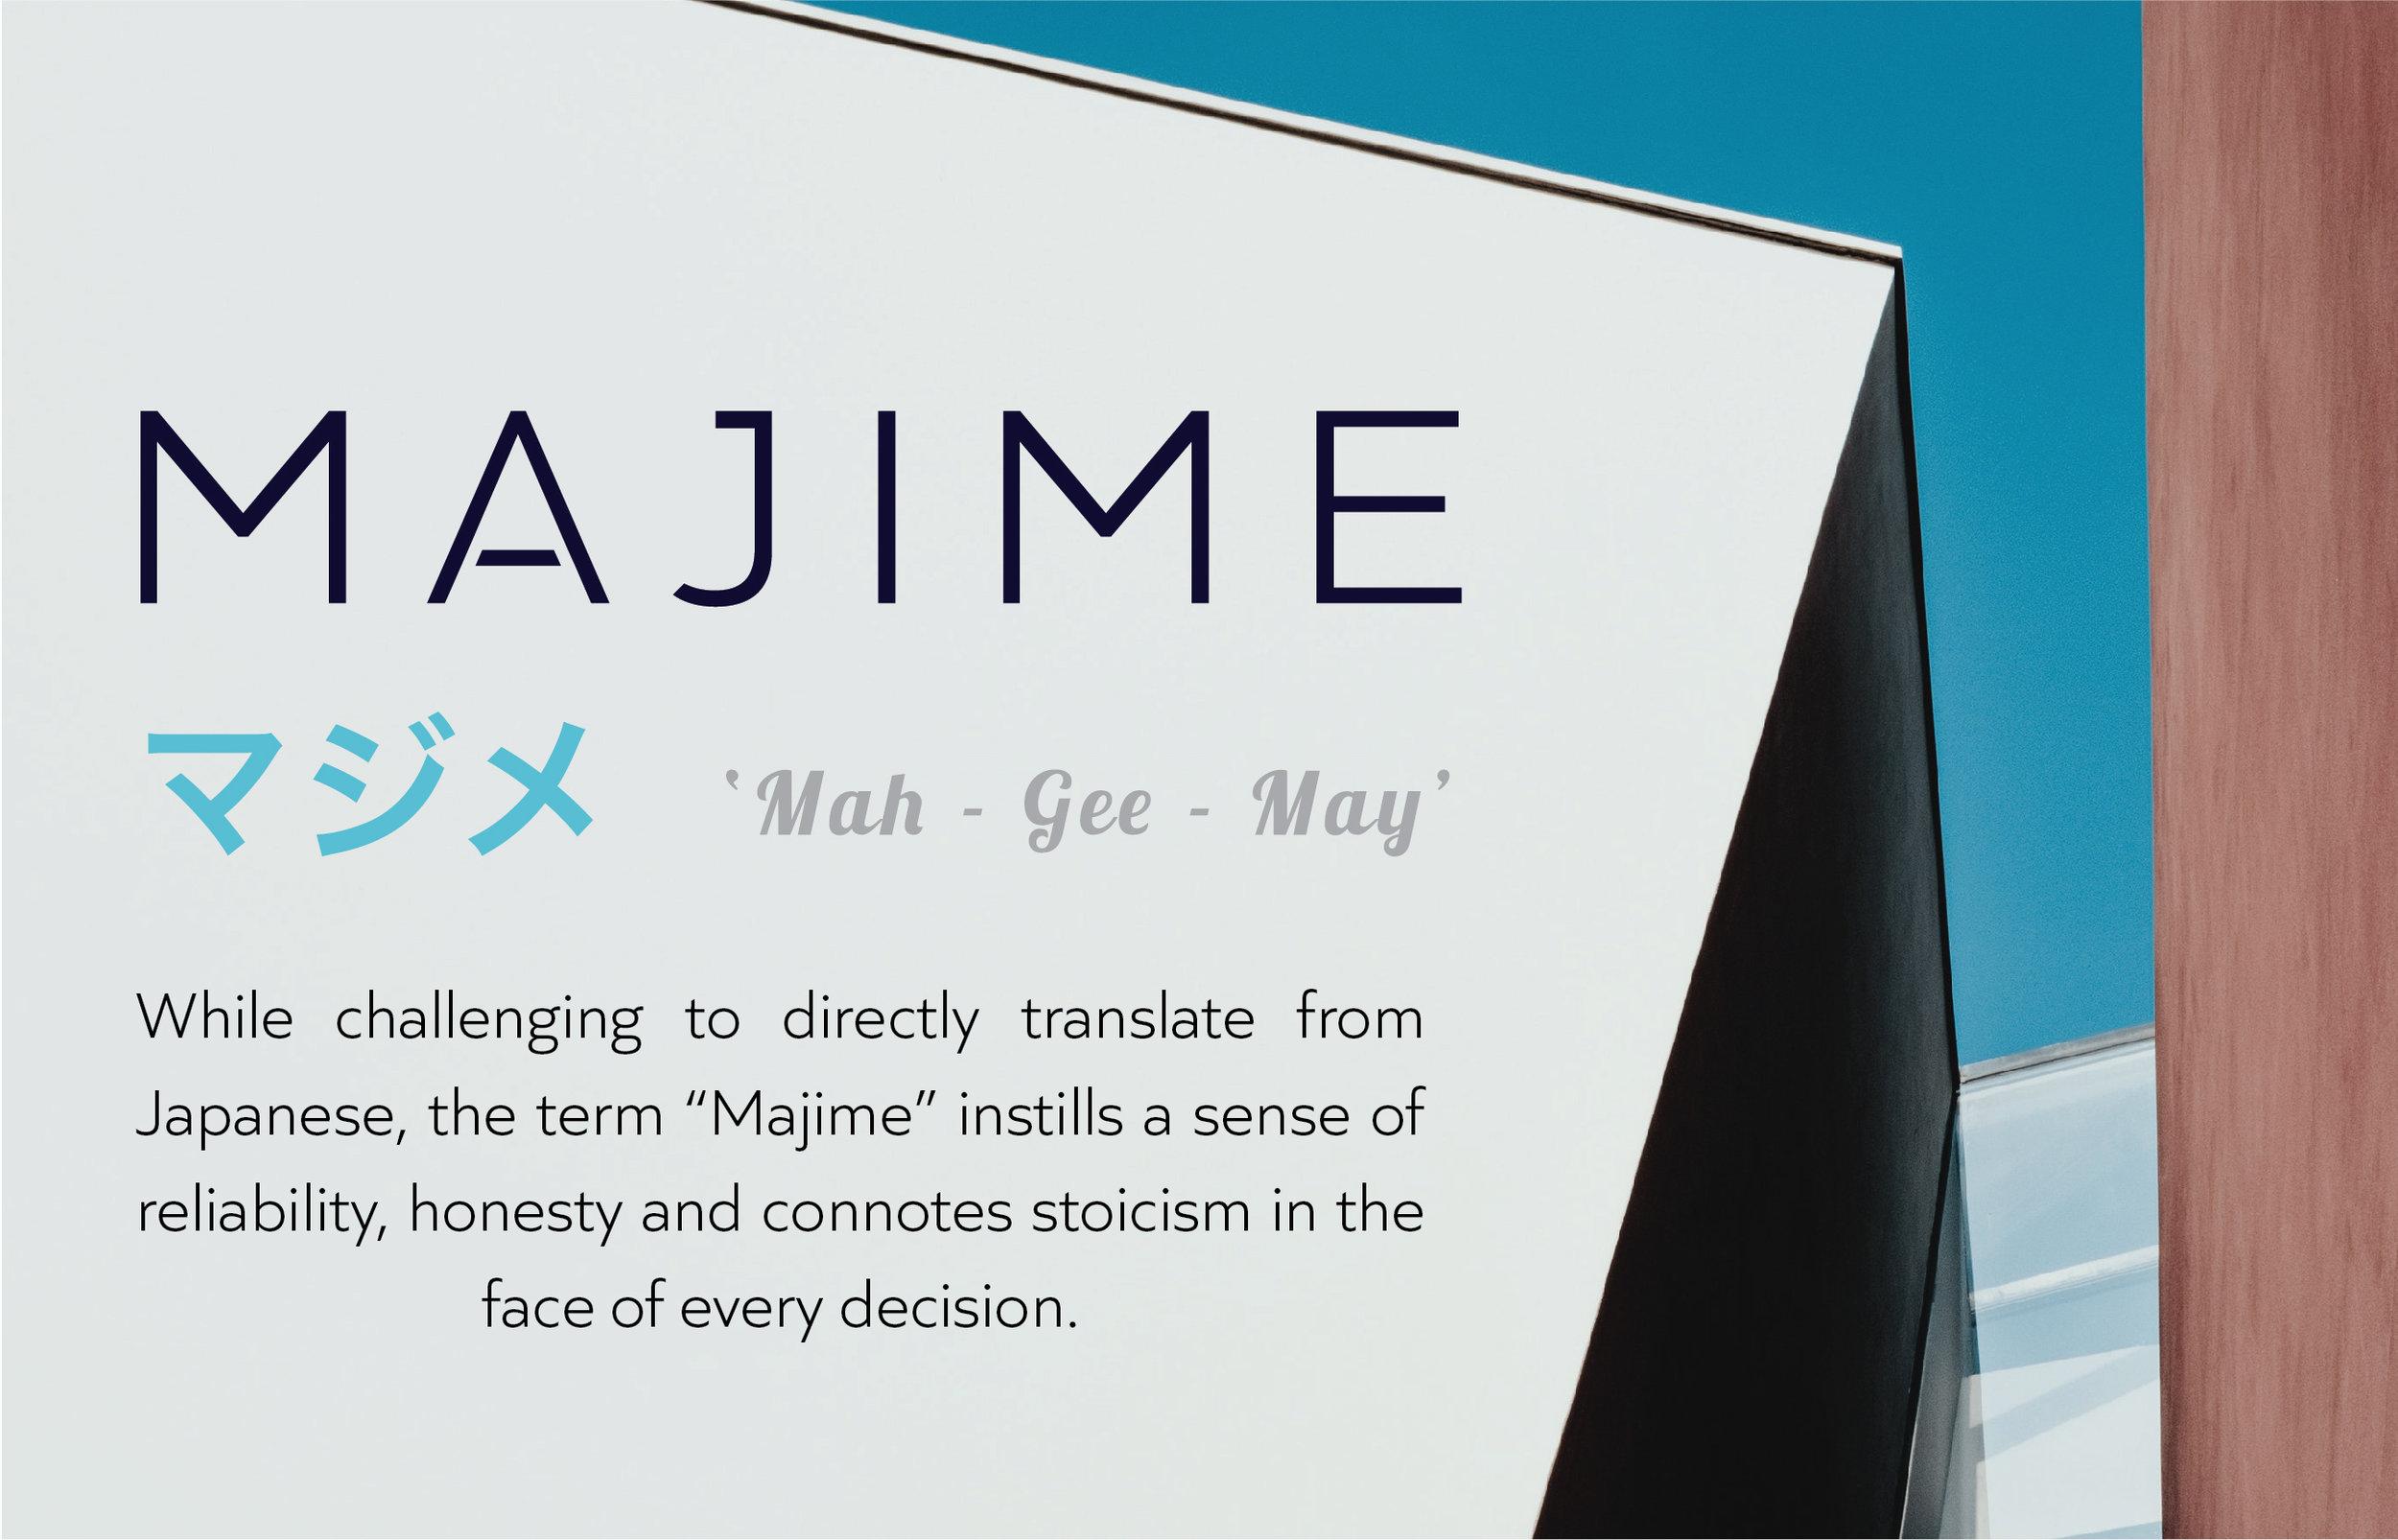 Majime_Meaning-01.jpg